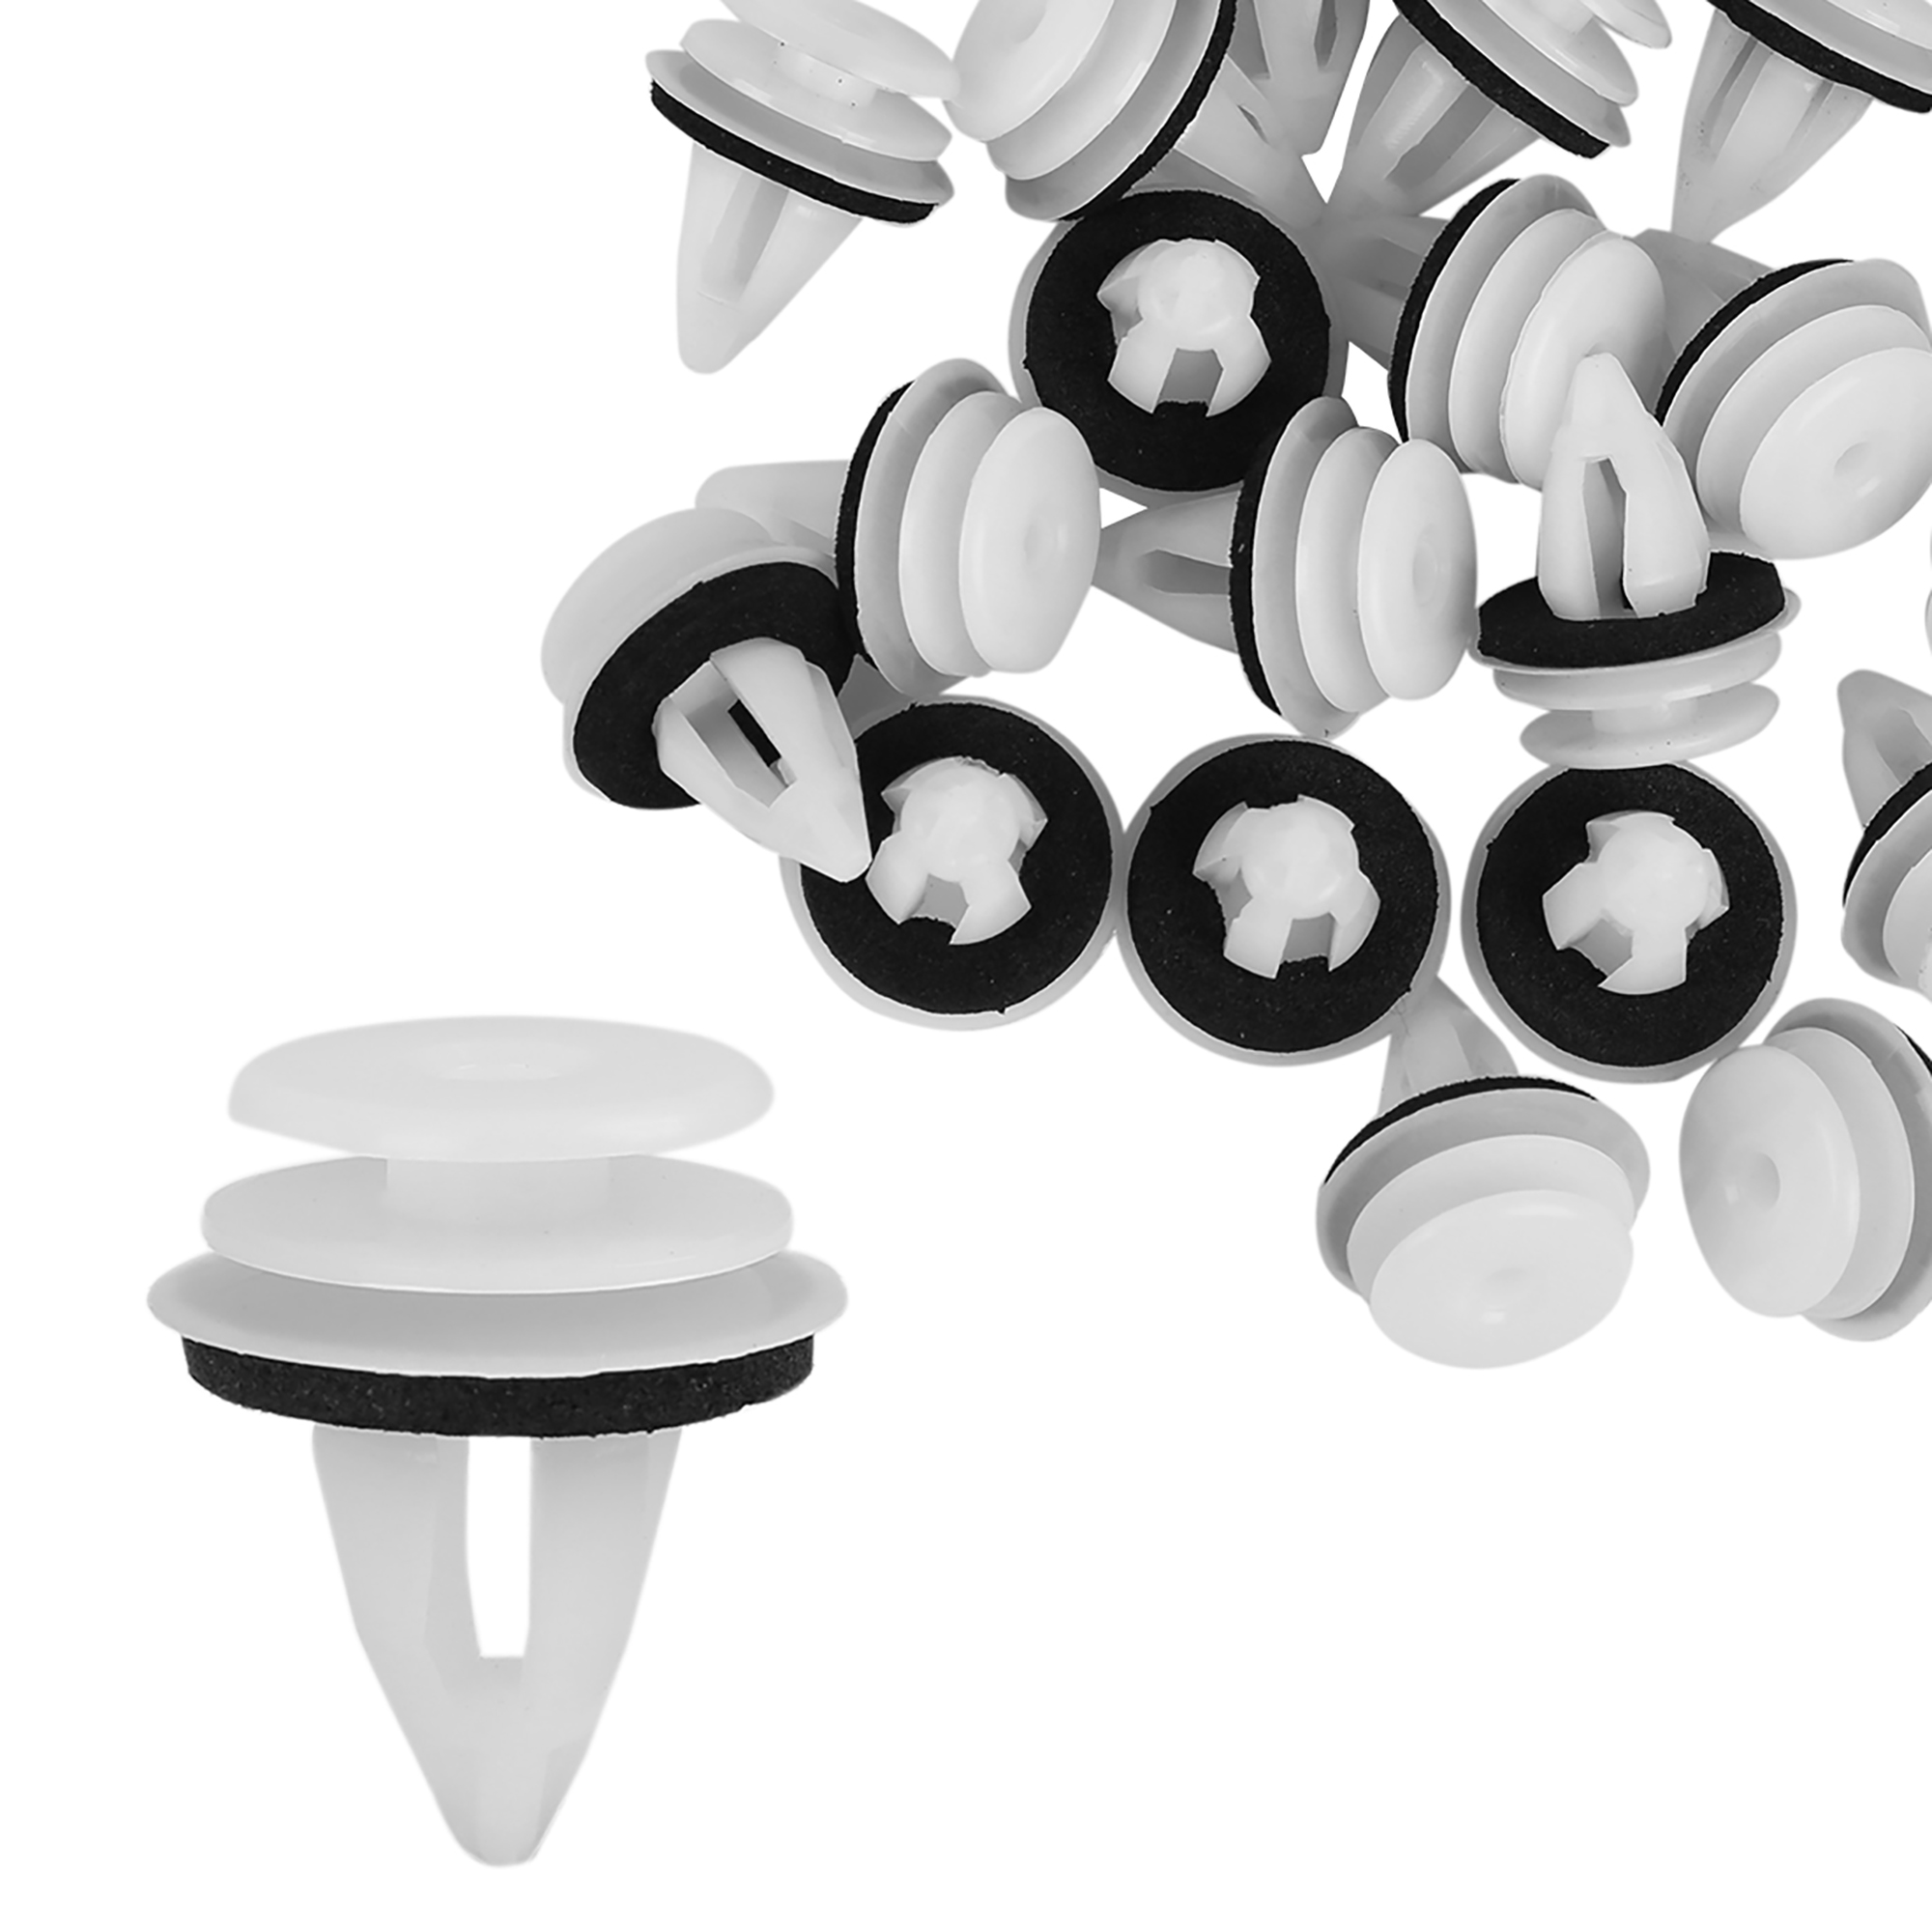 20pcs Plastic White Retainer Clips for BMW E46 E90 F30 X5 X3 E60 51418224768